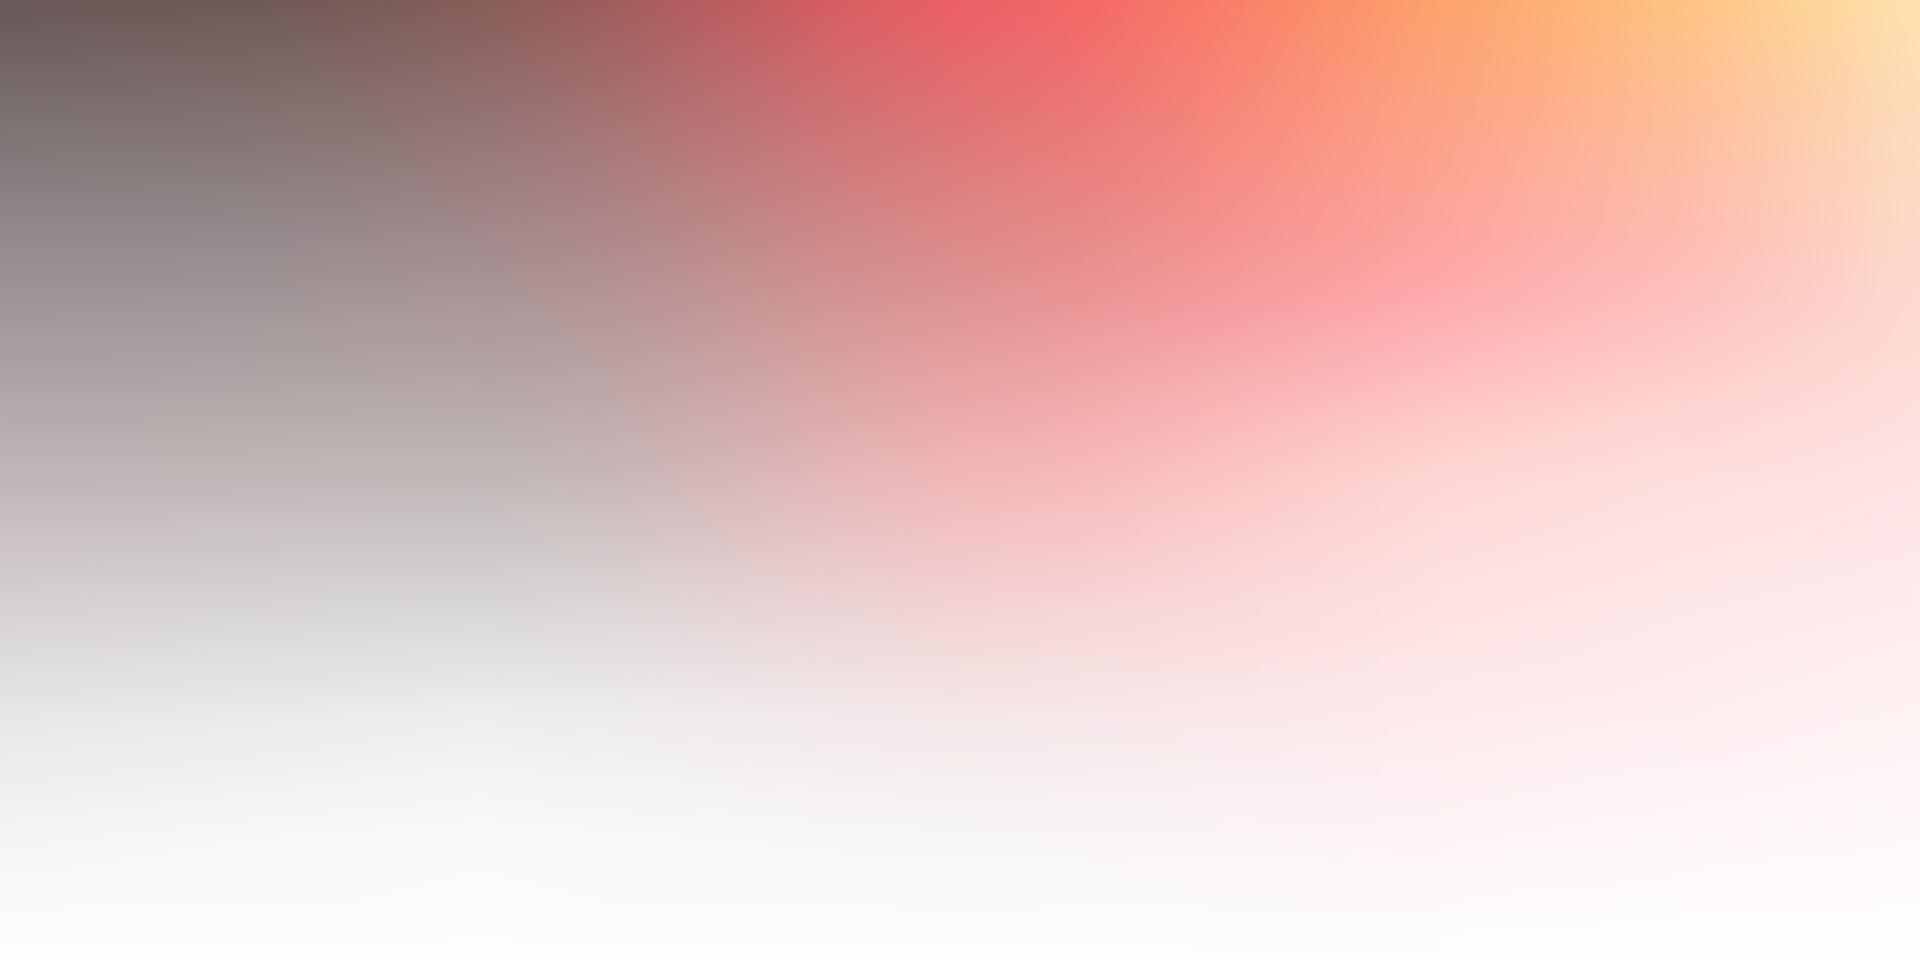 mörkrosa, gul vektor suddig bakgrund.